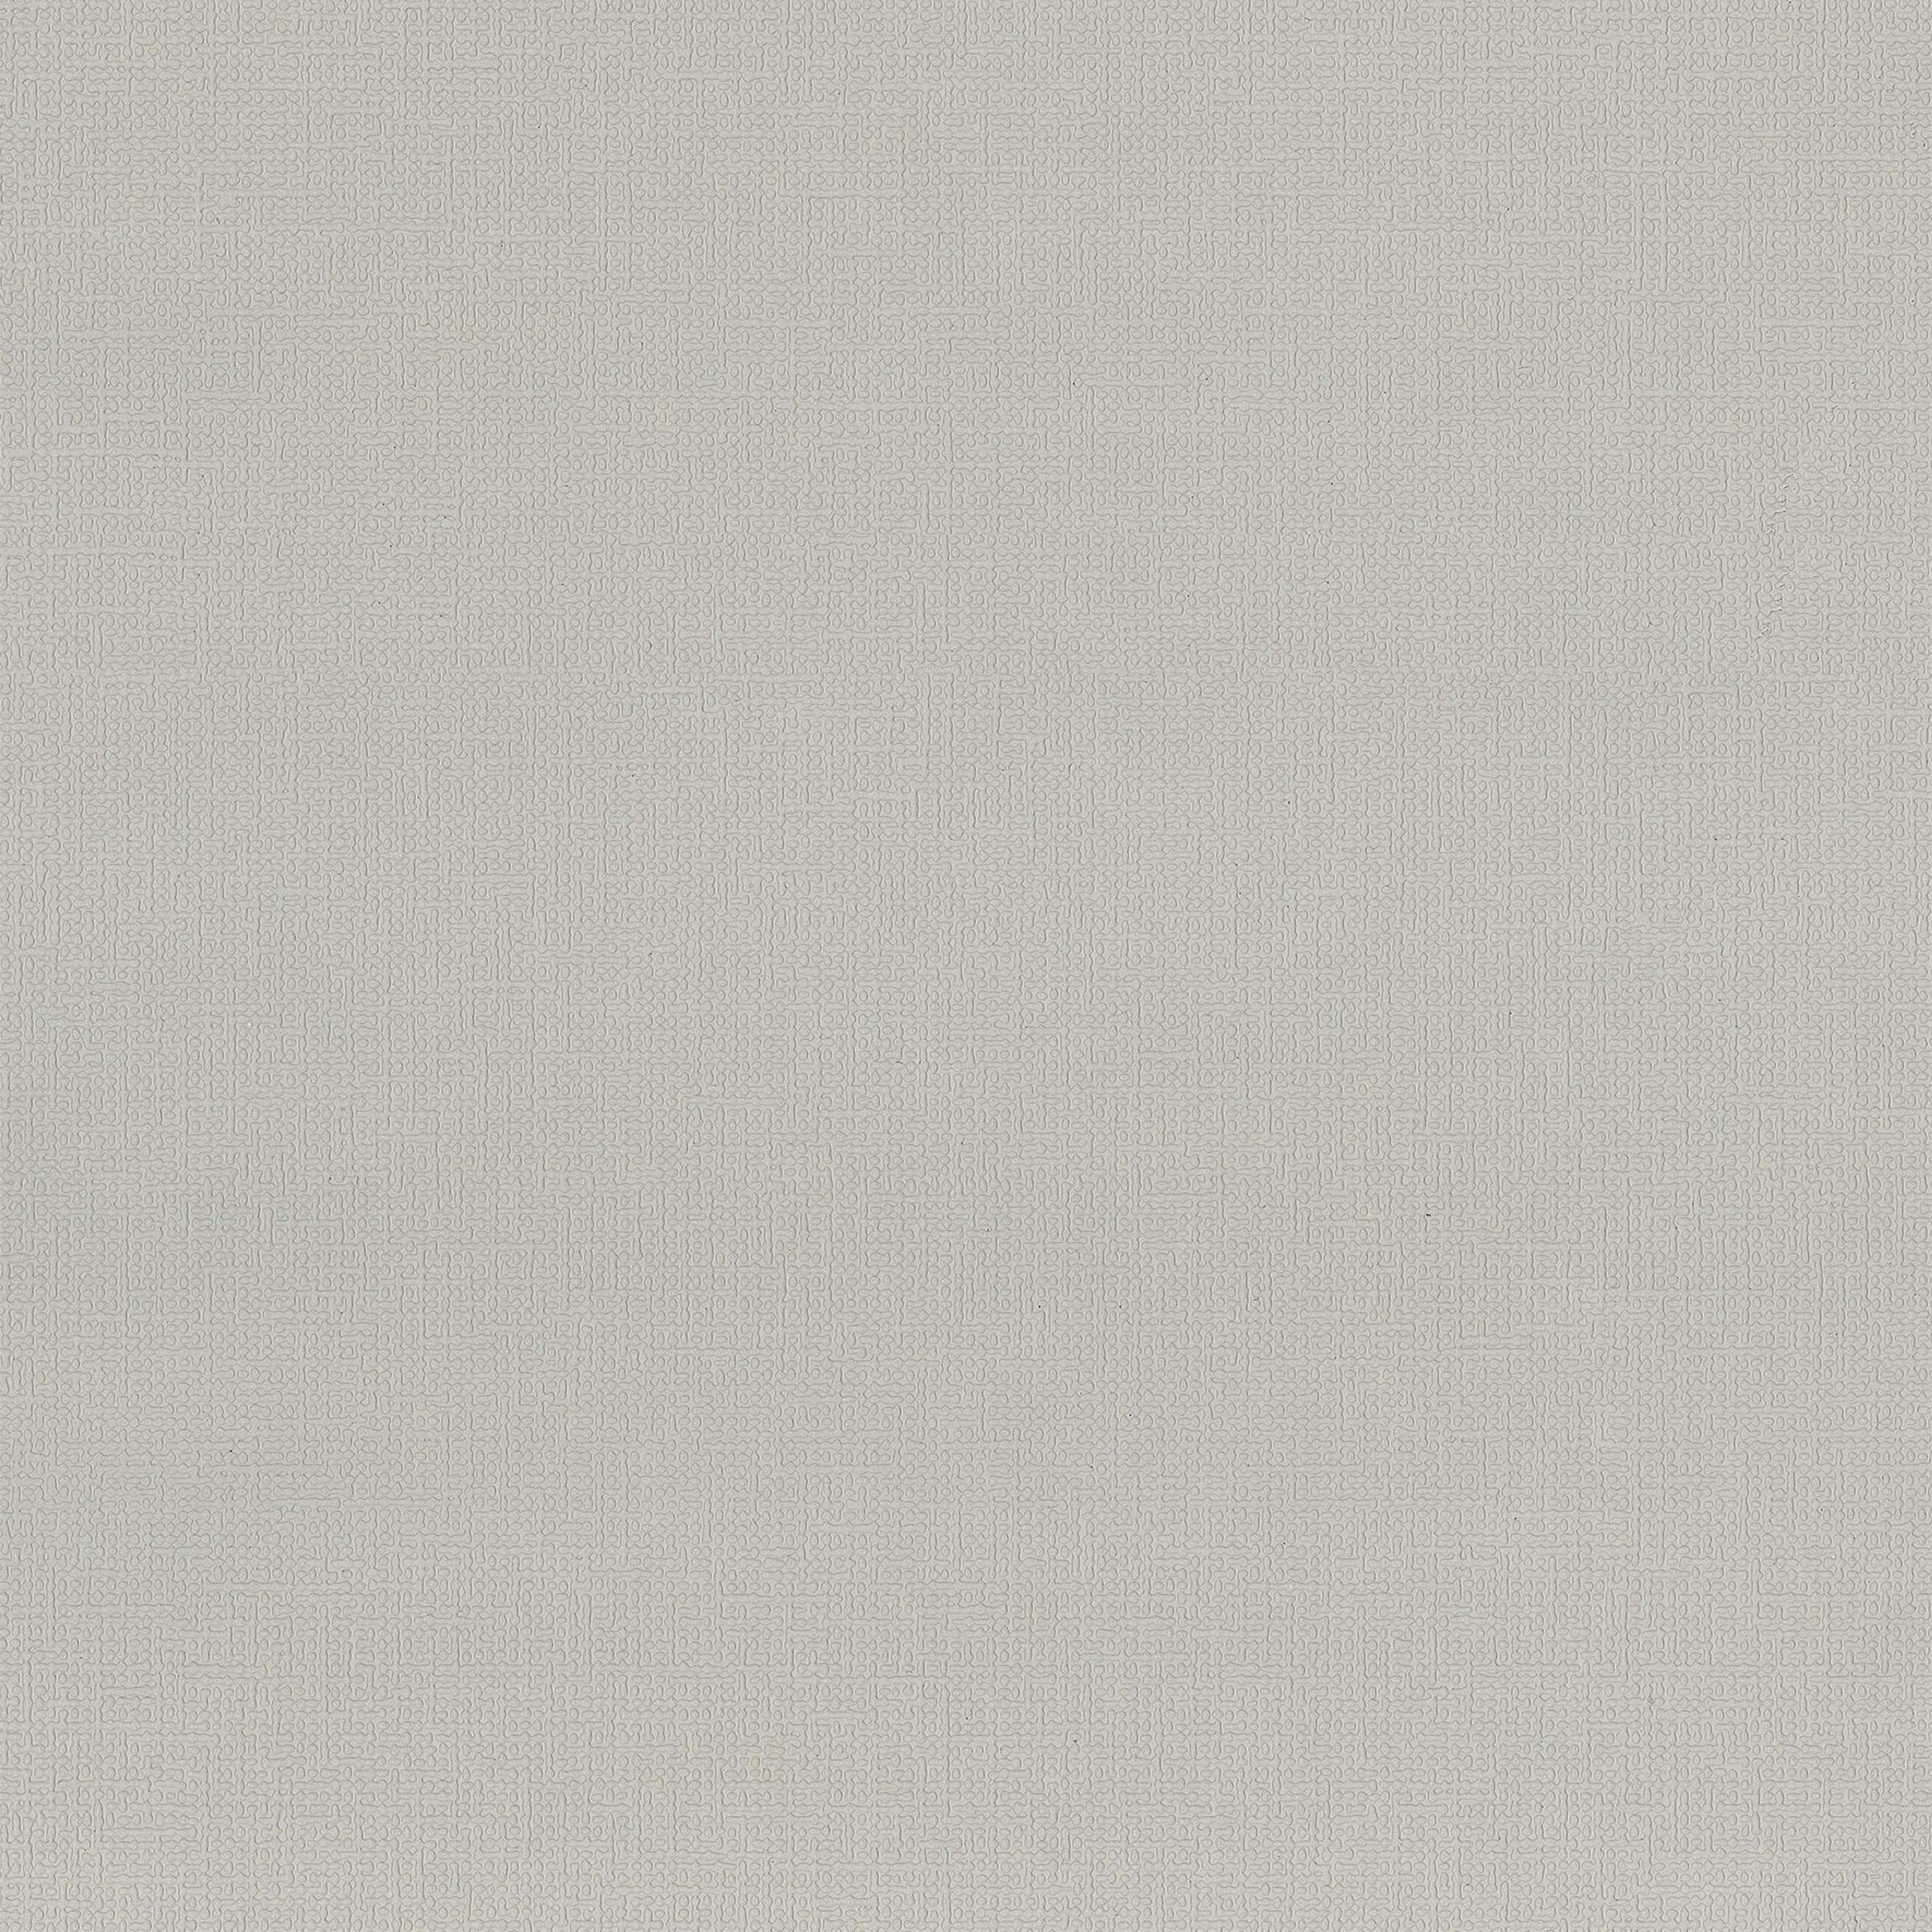 Vliesbehang structuur taupe dessin 31 555 behang for Structuur behang